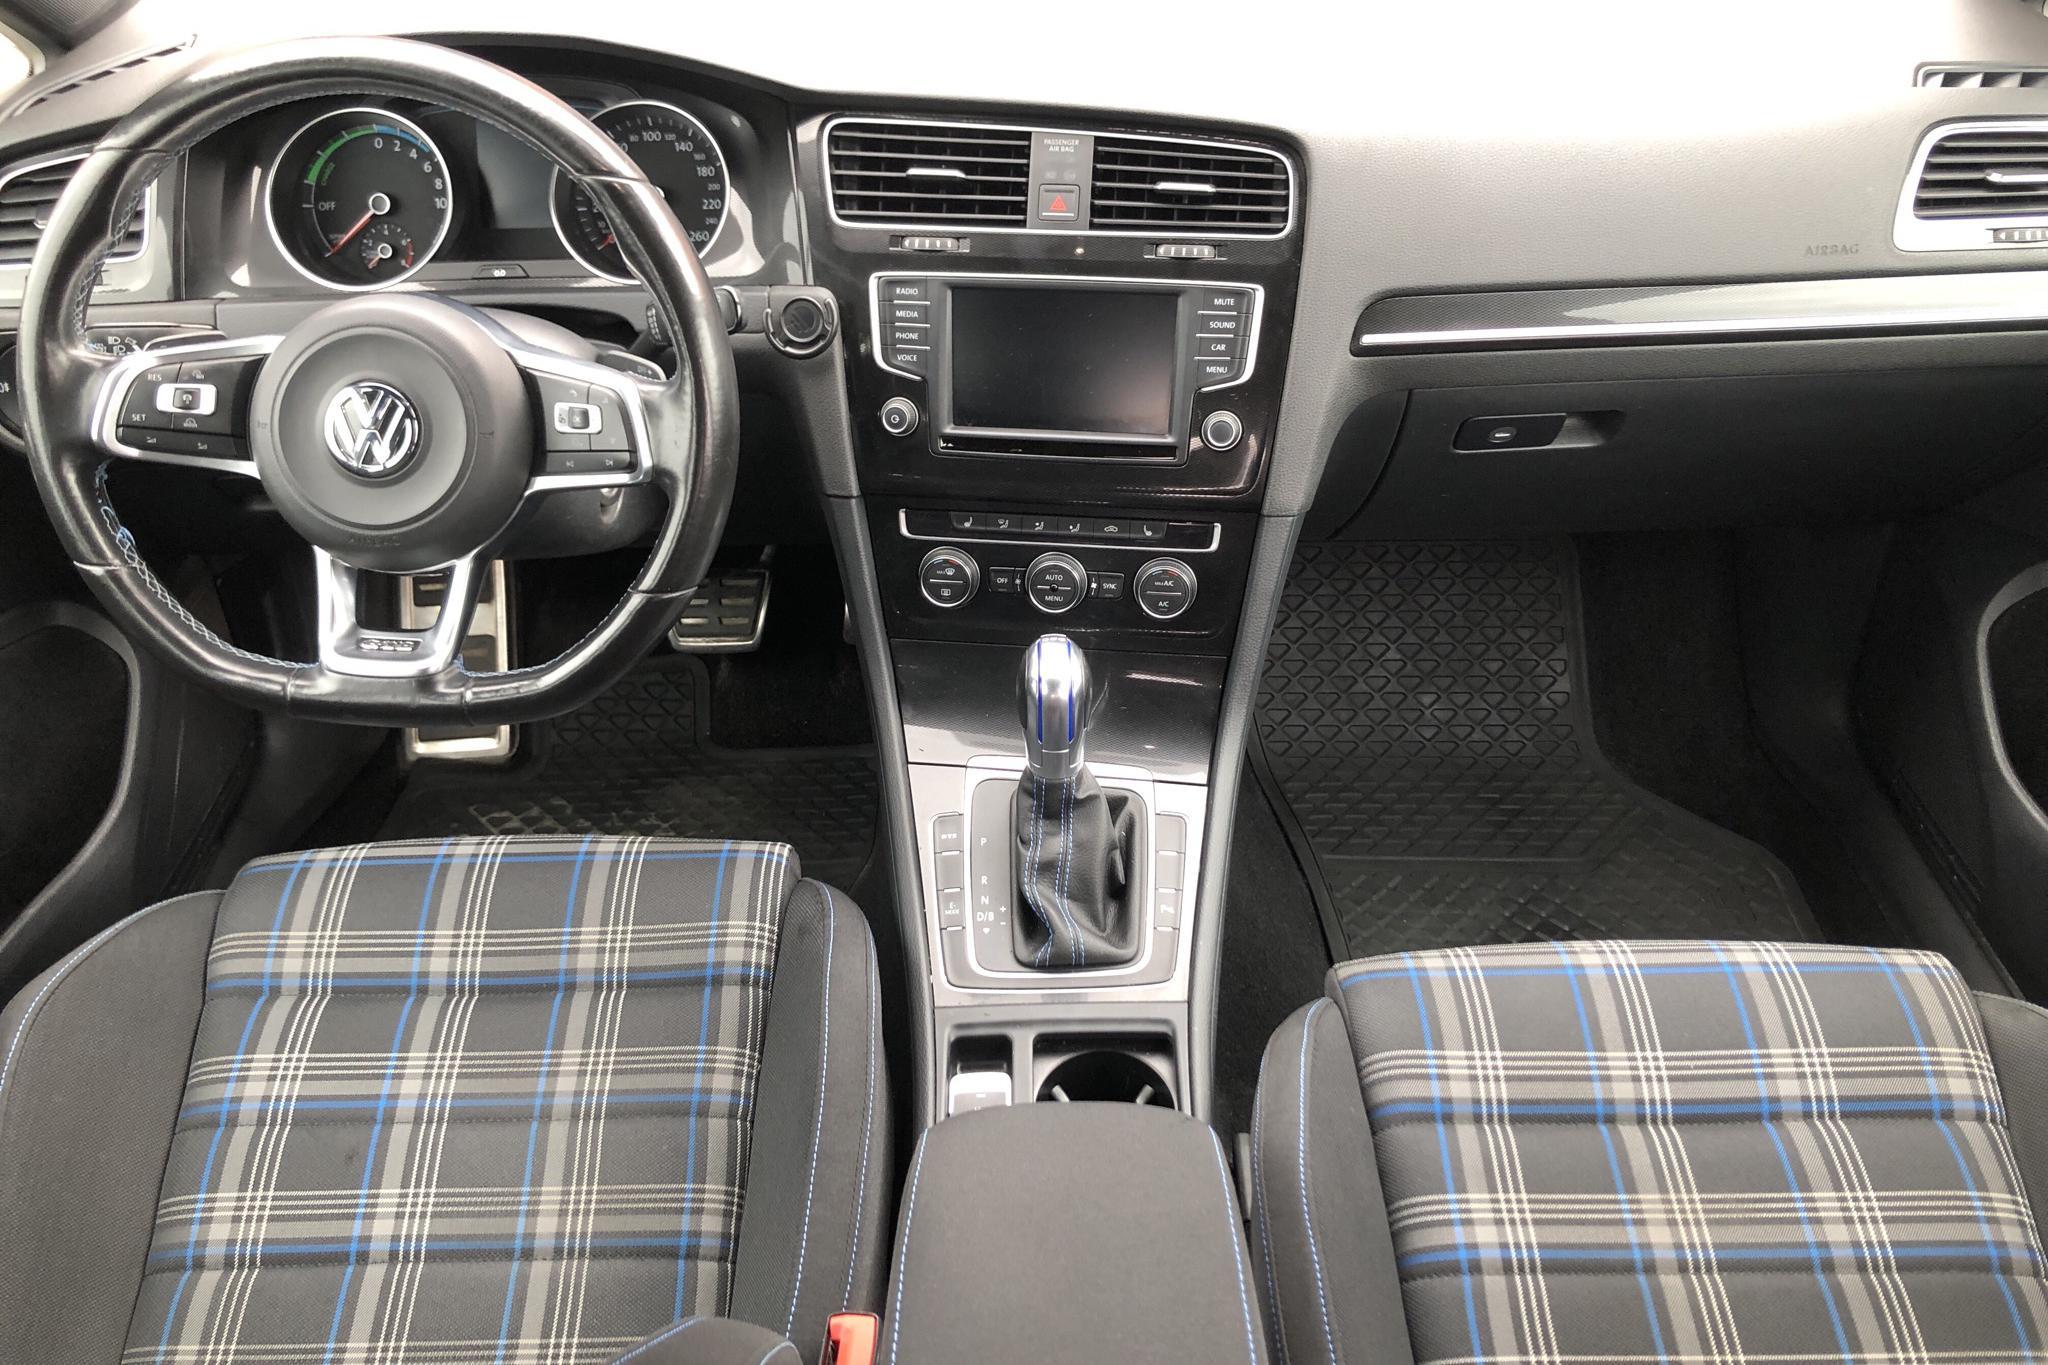 VW Golf VII 1.4 Plug-in-Hybrid 5dr (204hk) - 116 660 km - Automatic - white - 2016